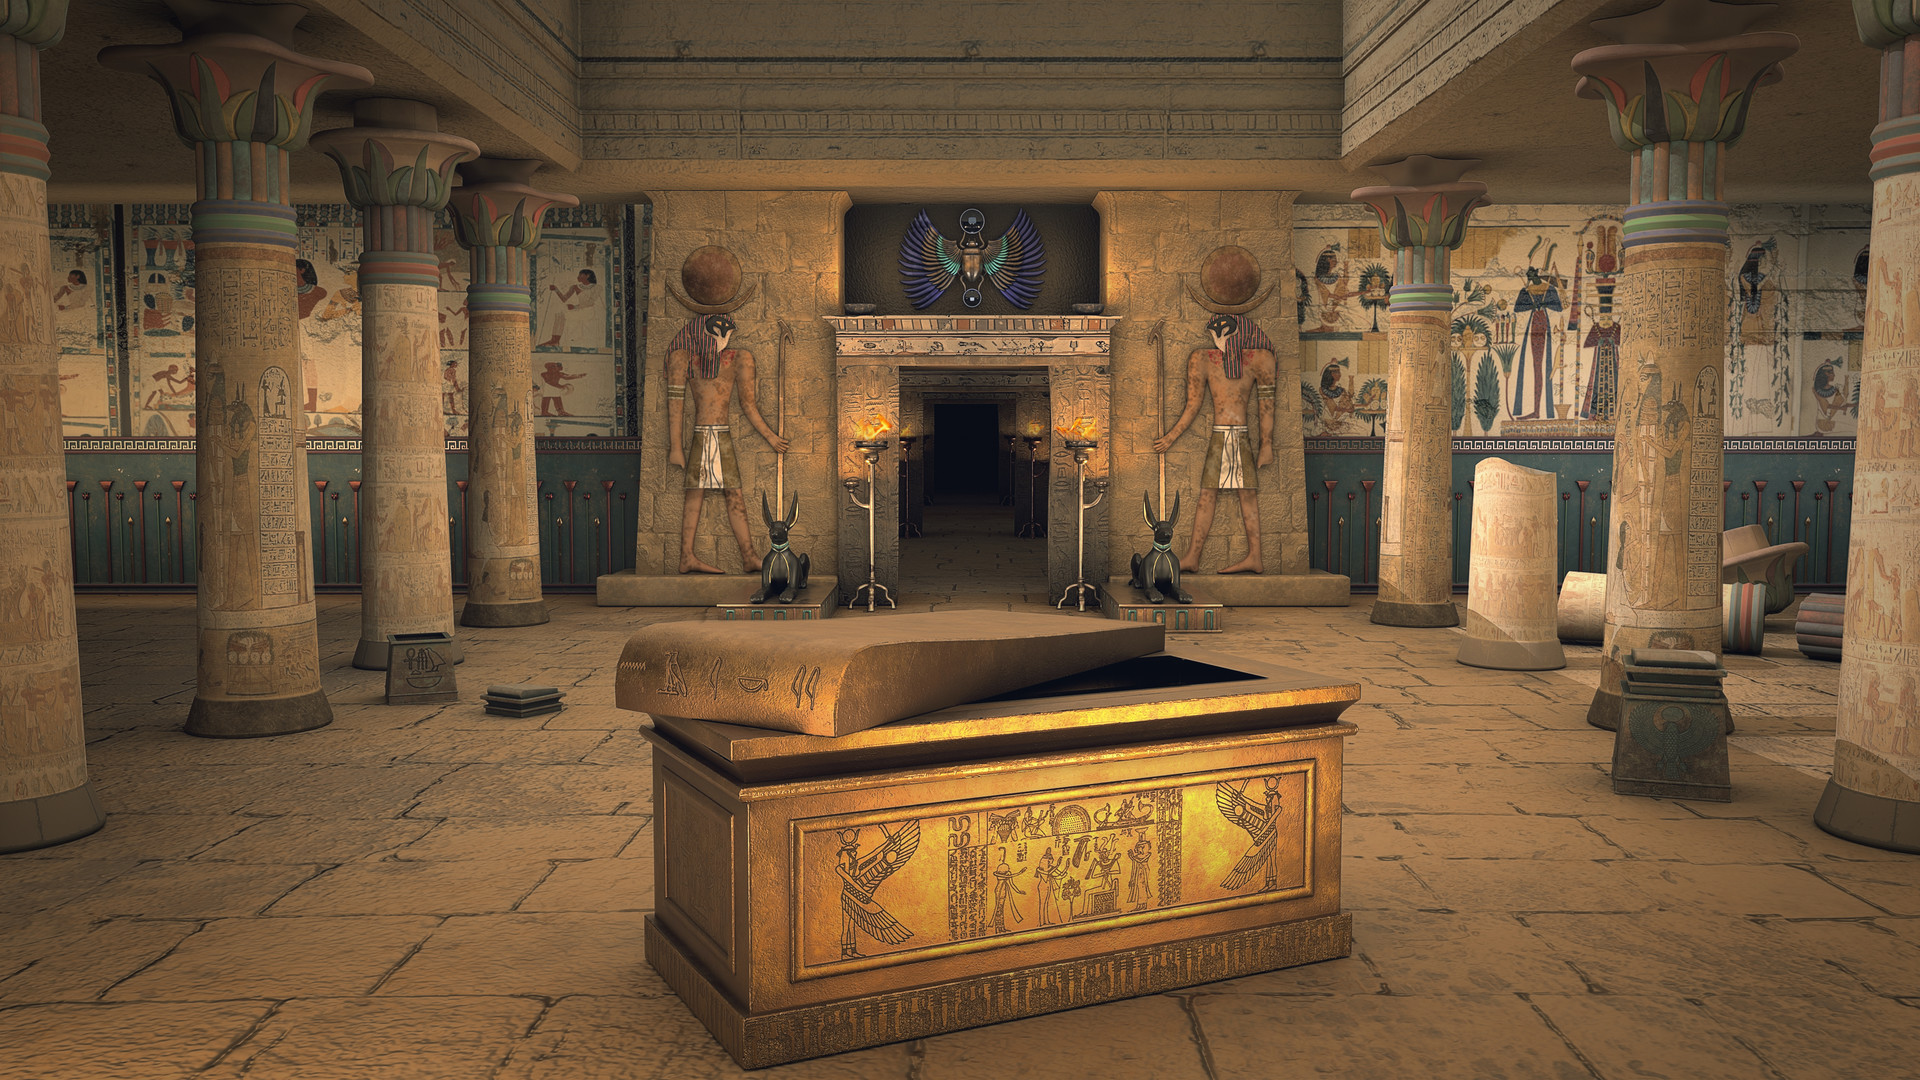 Nahikari M - Fictional recreation of the temple of anubis